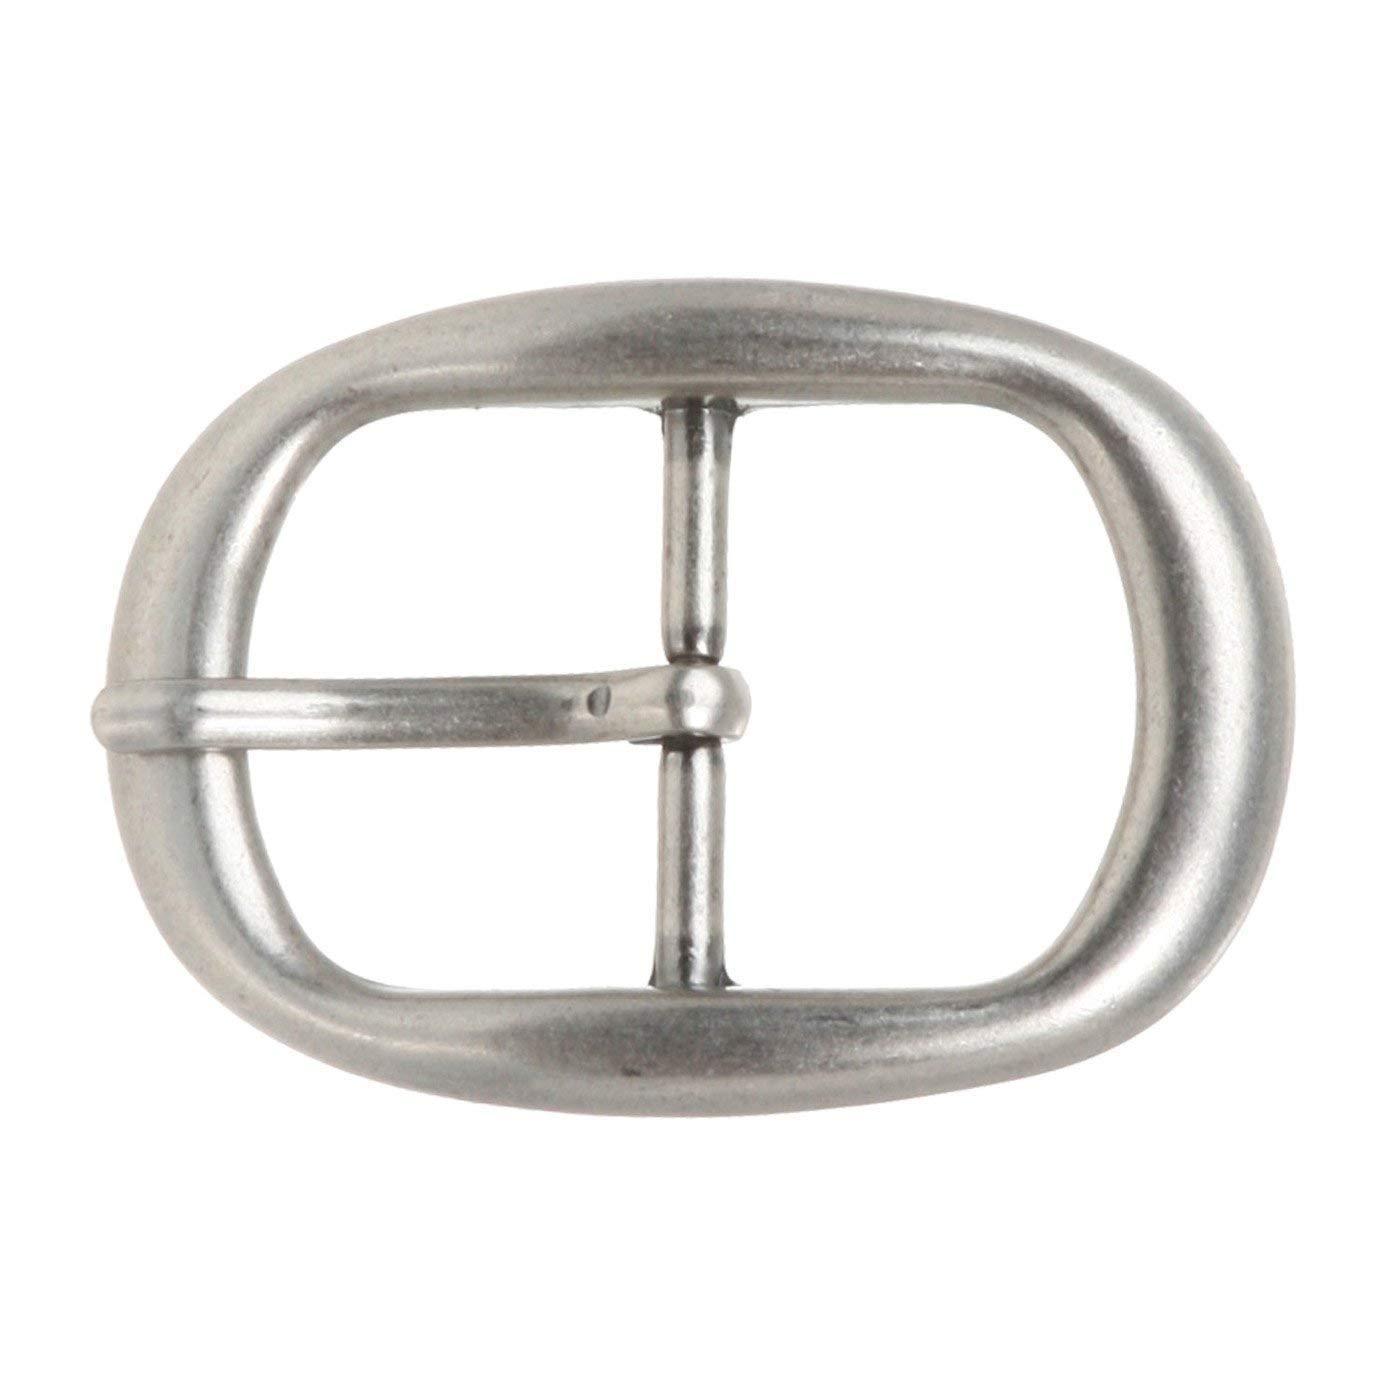 BBBelts Men Antique Silver Single Prong Center Bar Oval Buckle For 1-1//4 Belts